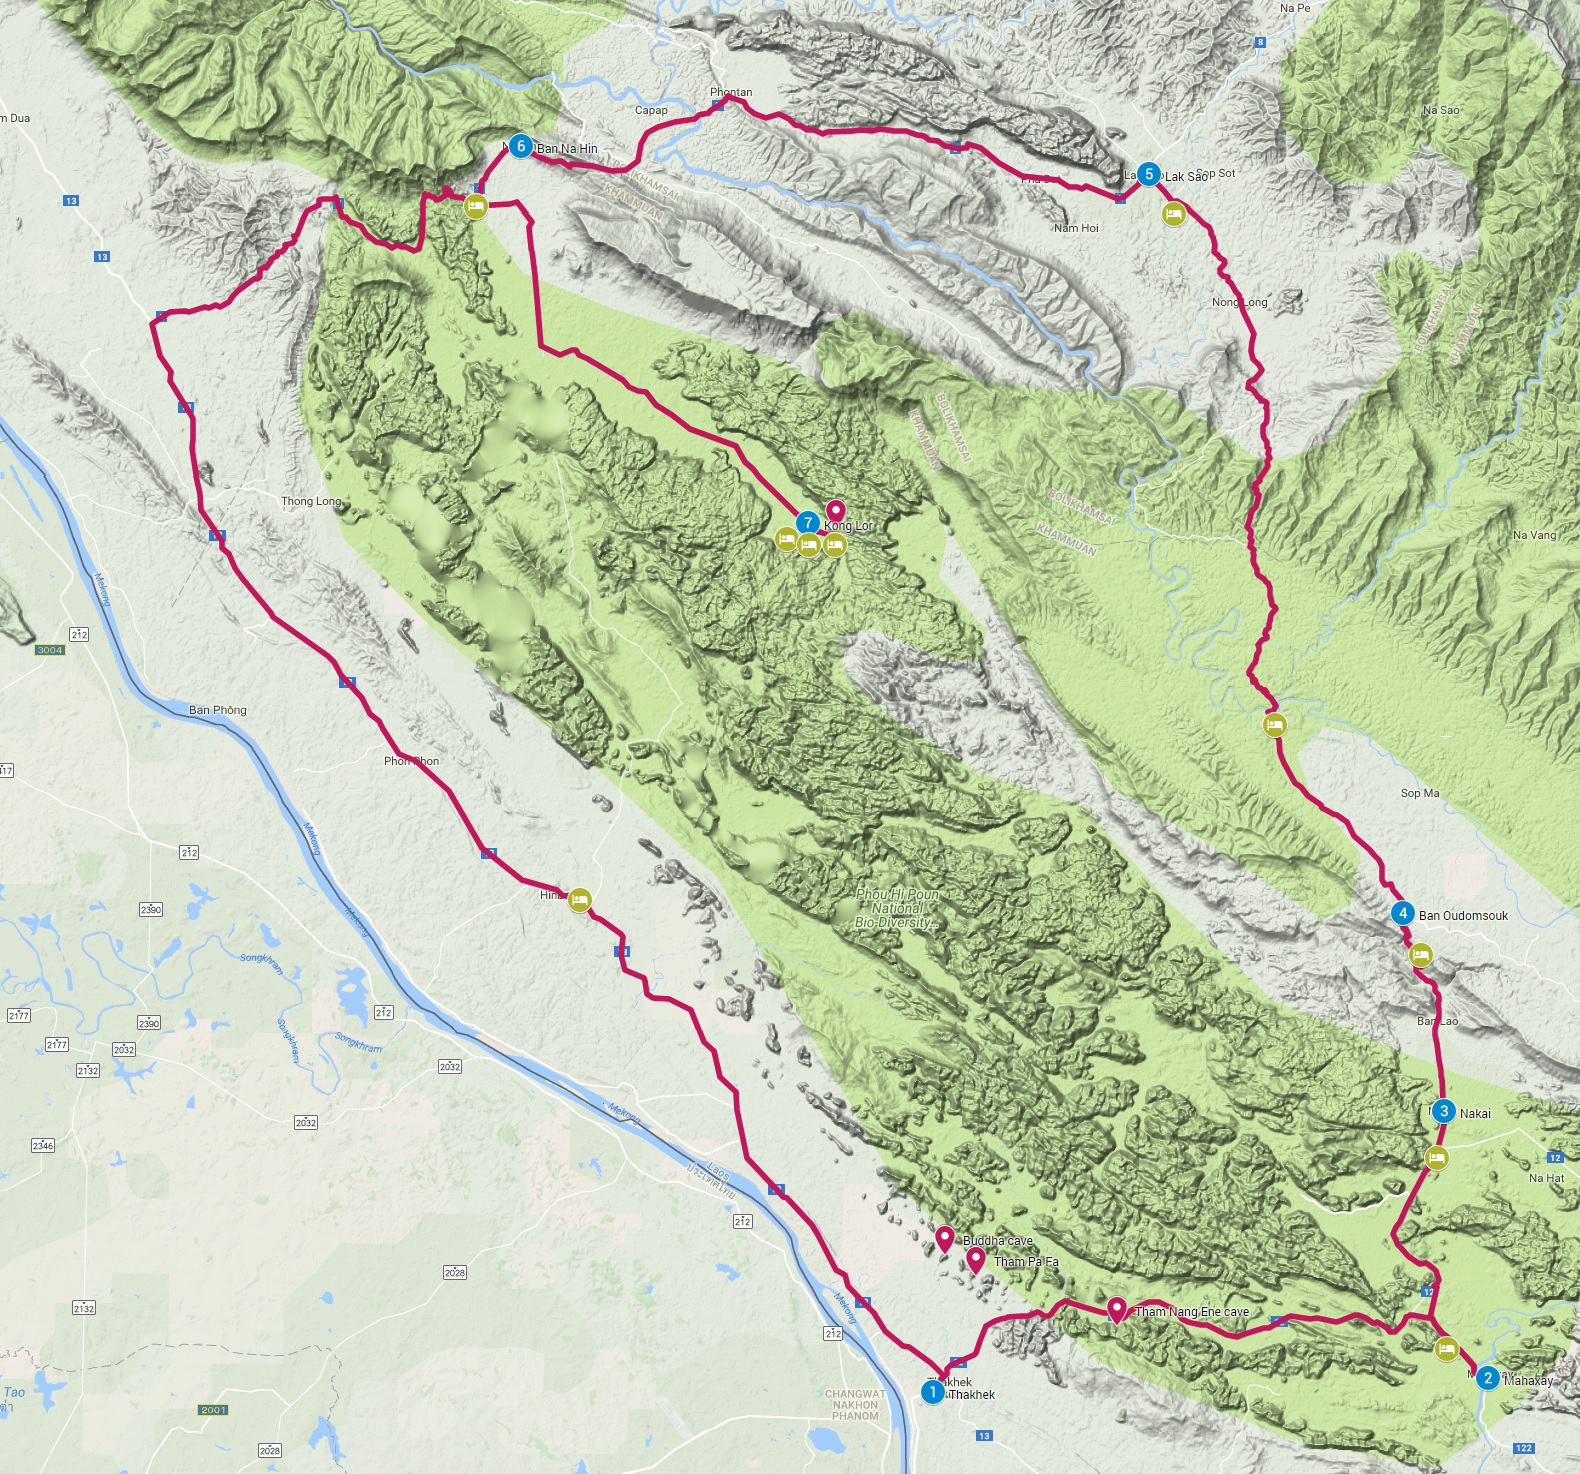 Thakhek the loop Laos route